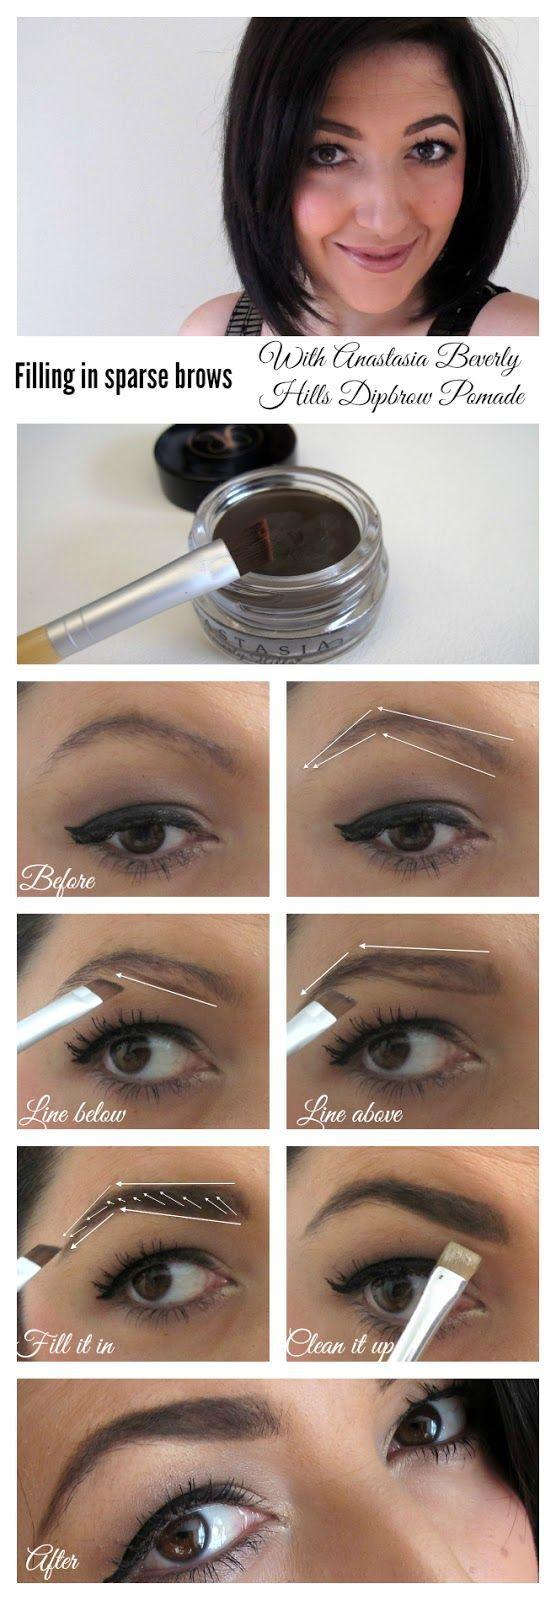 anastasia beverly hills eyebrow tutorial